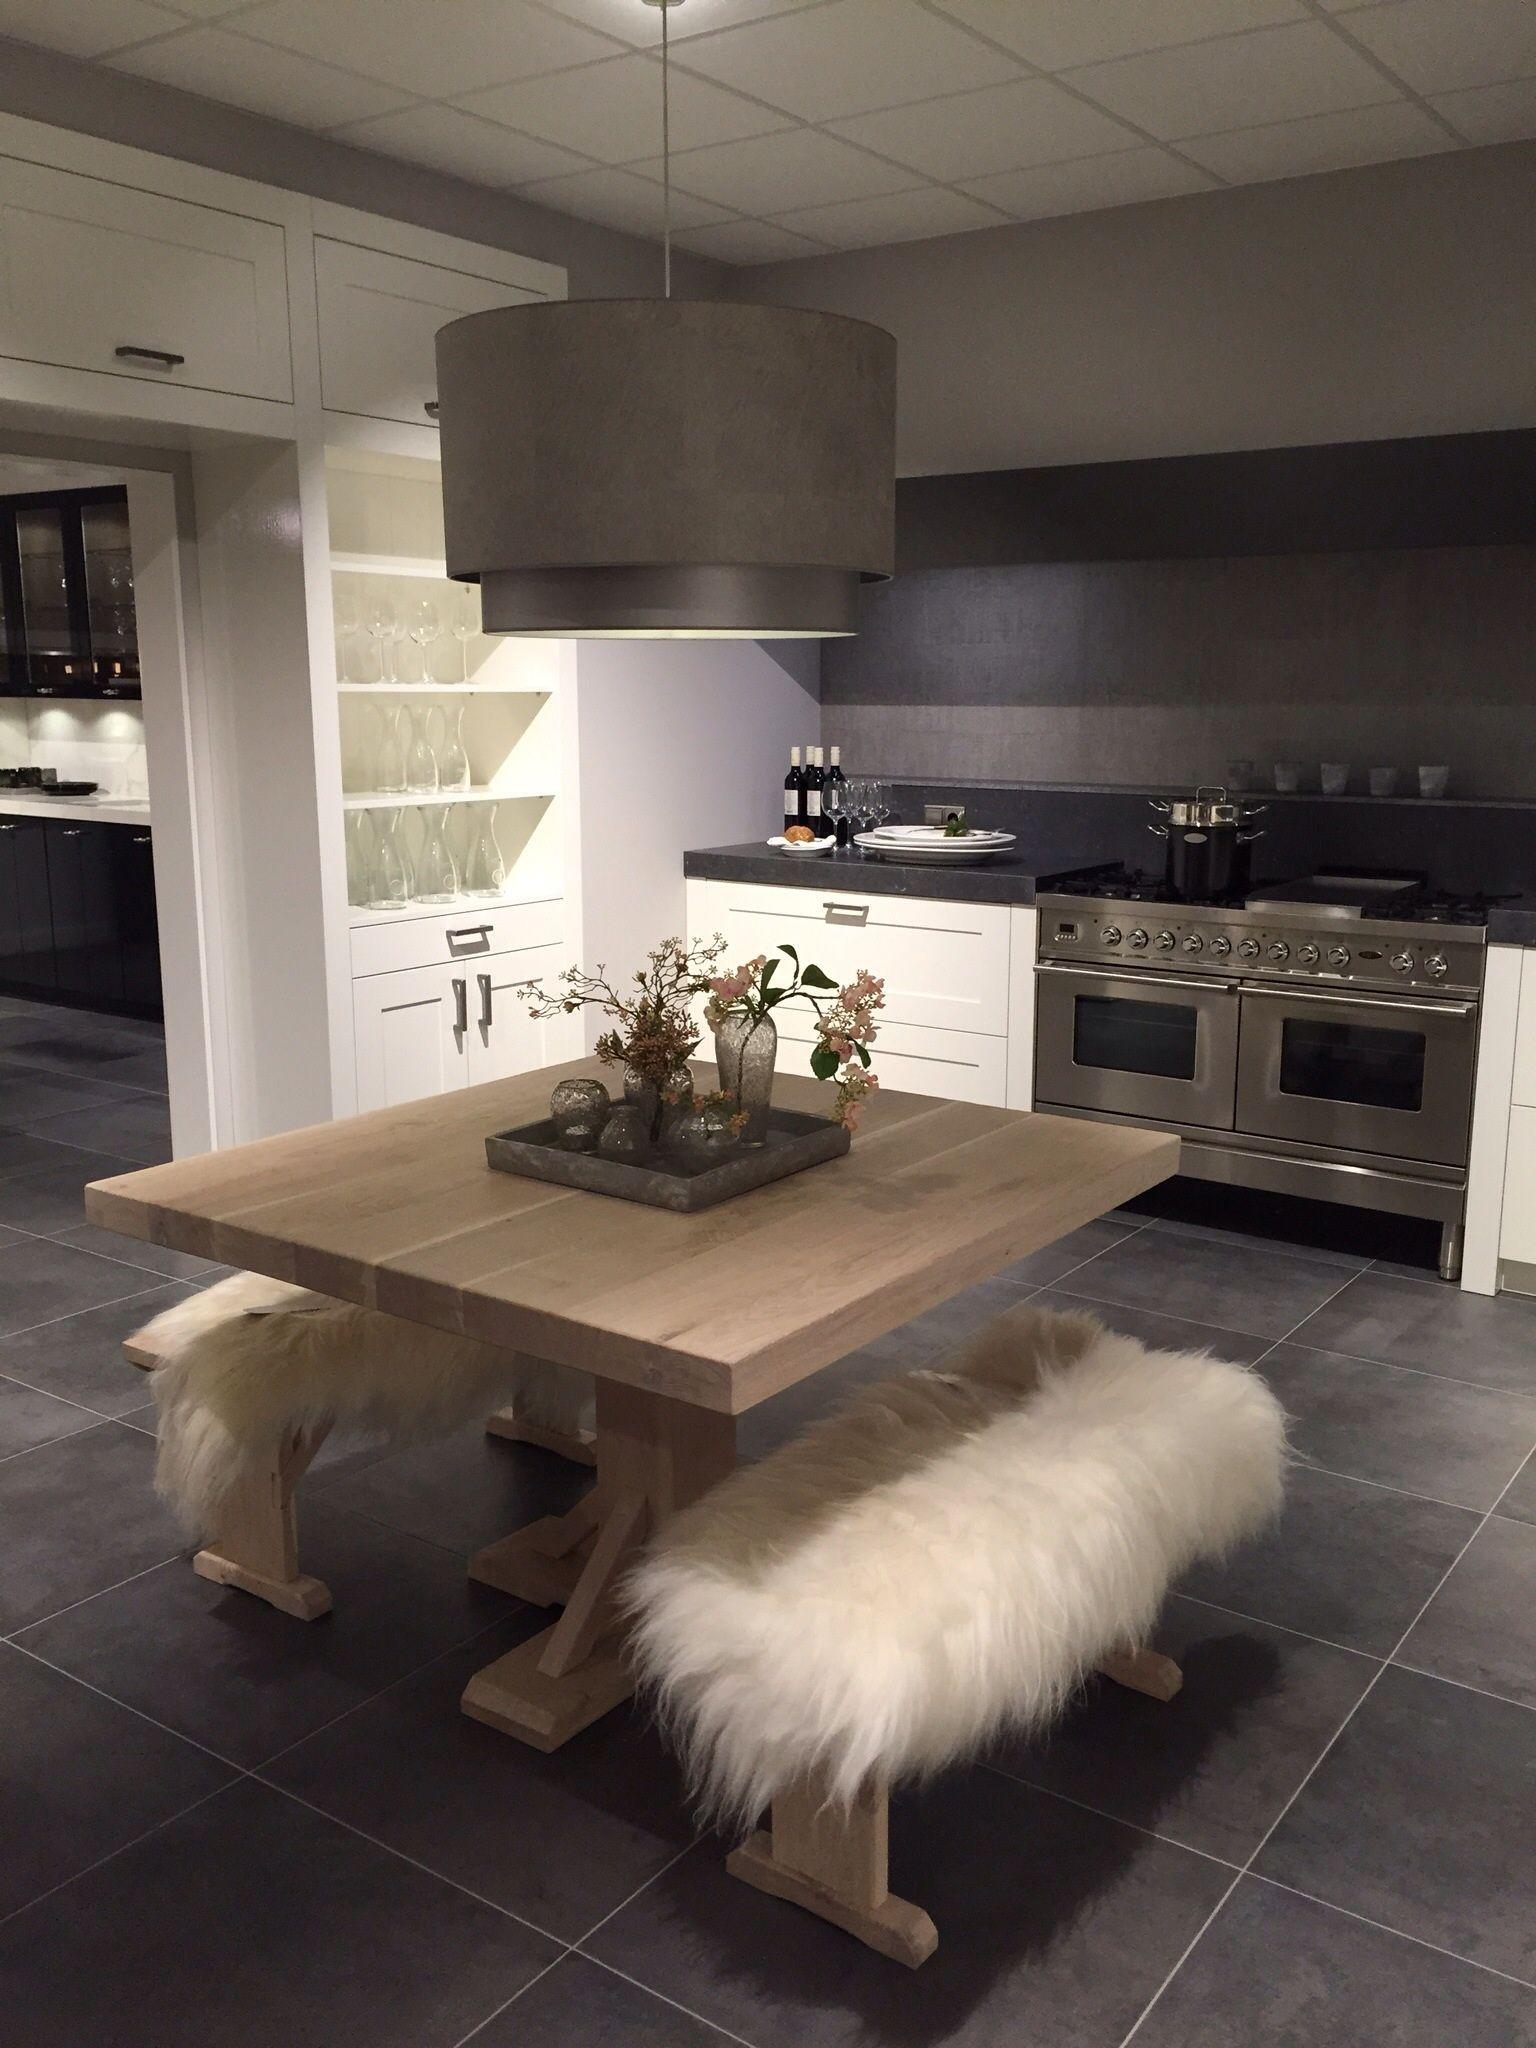 Middelkoop keukens Culemborg. Maatwerk meubels verlichting styling ...